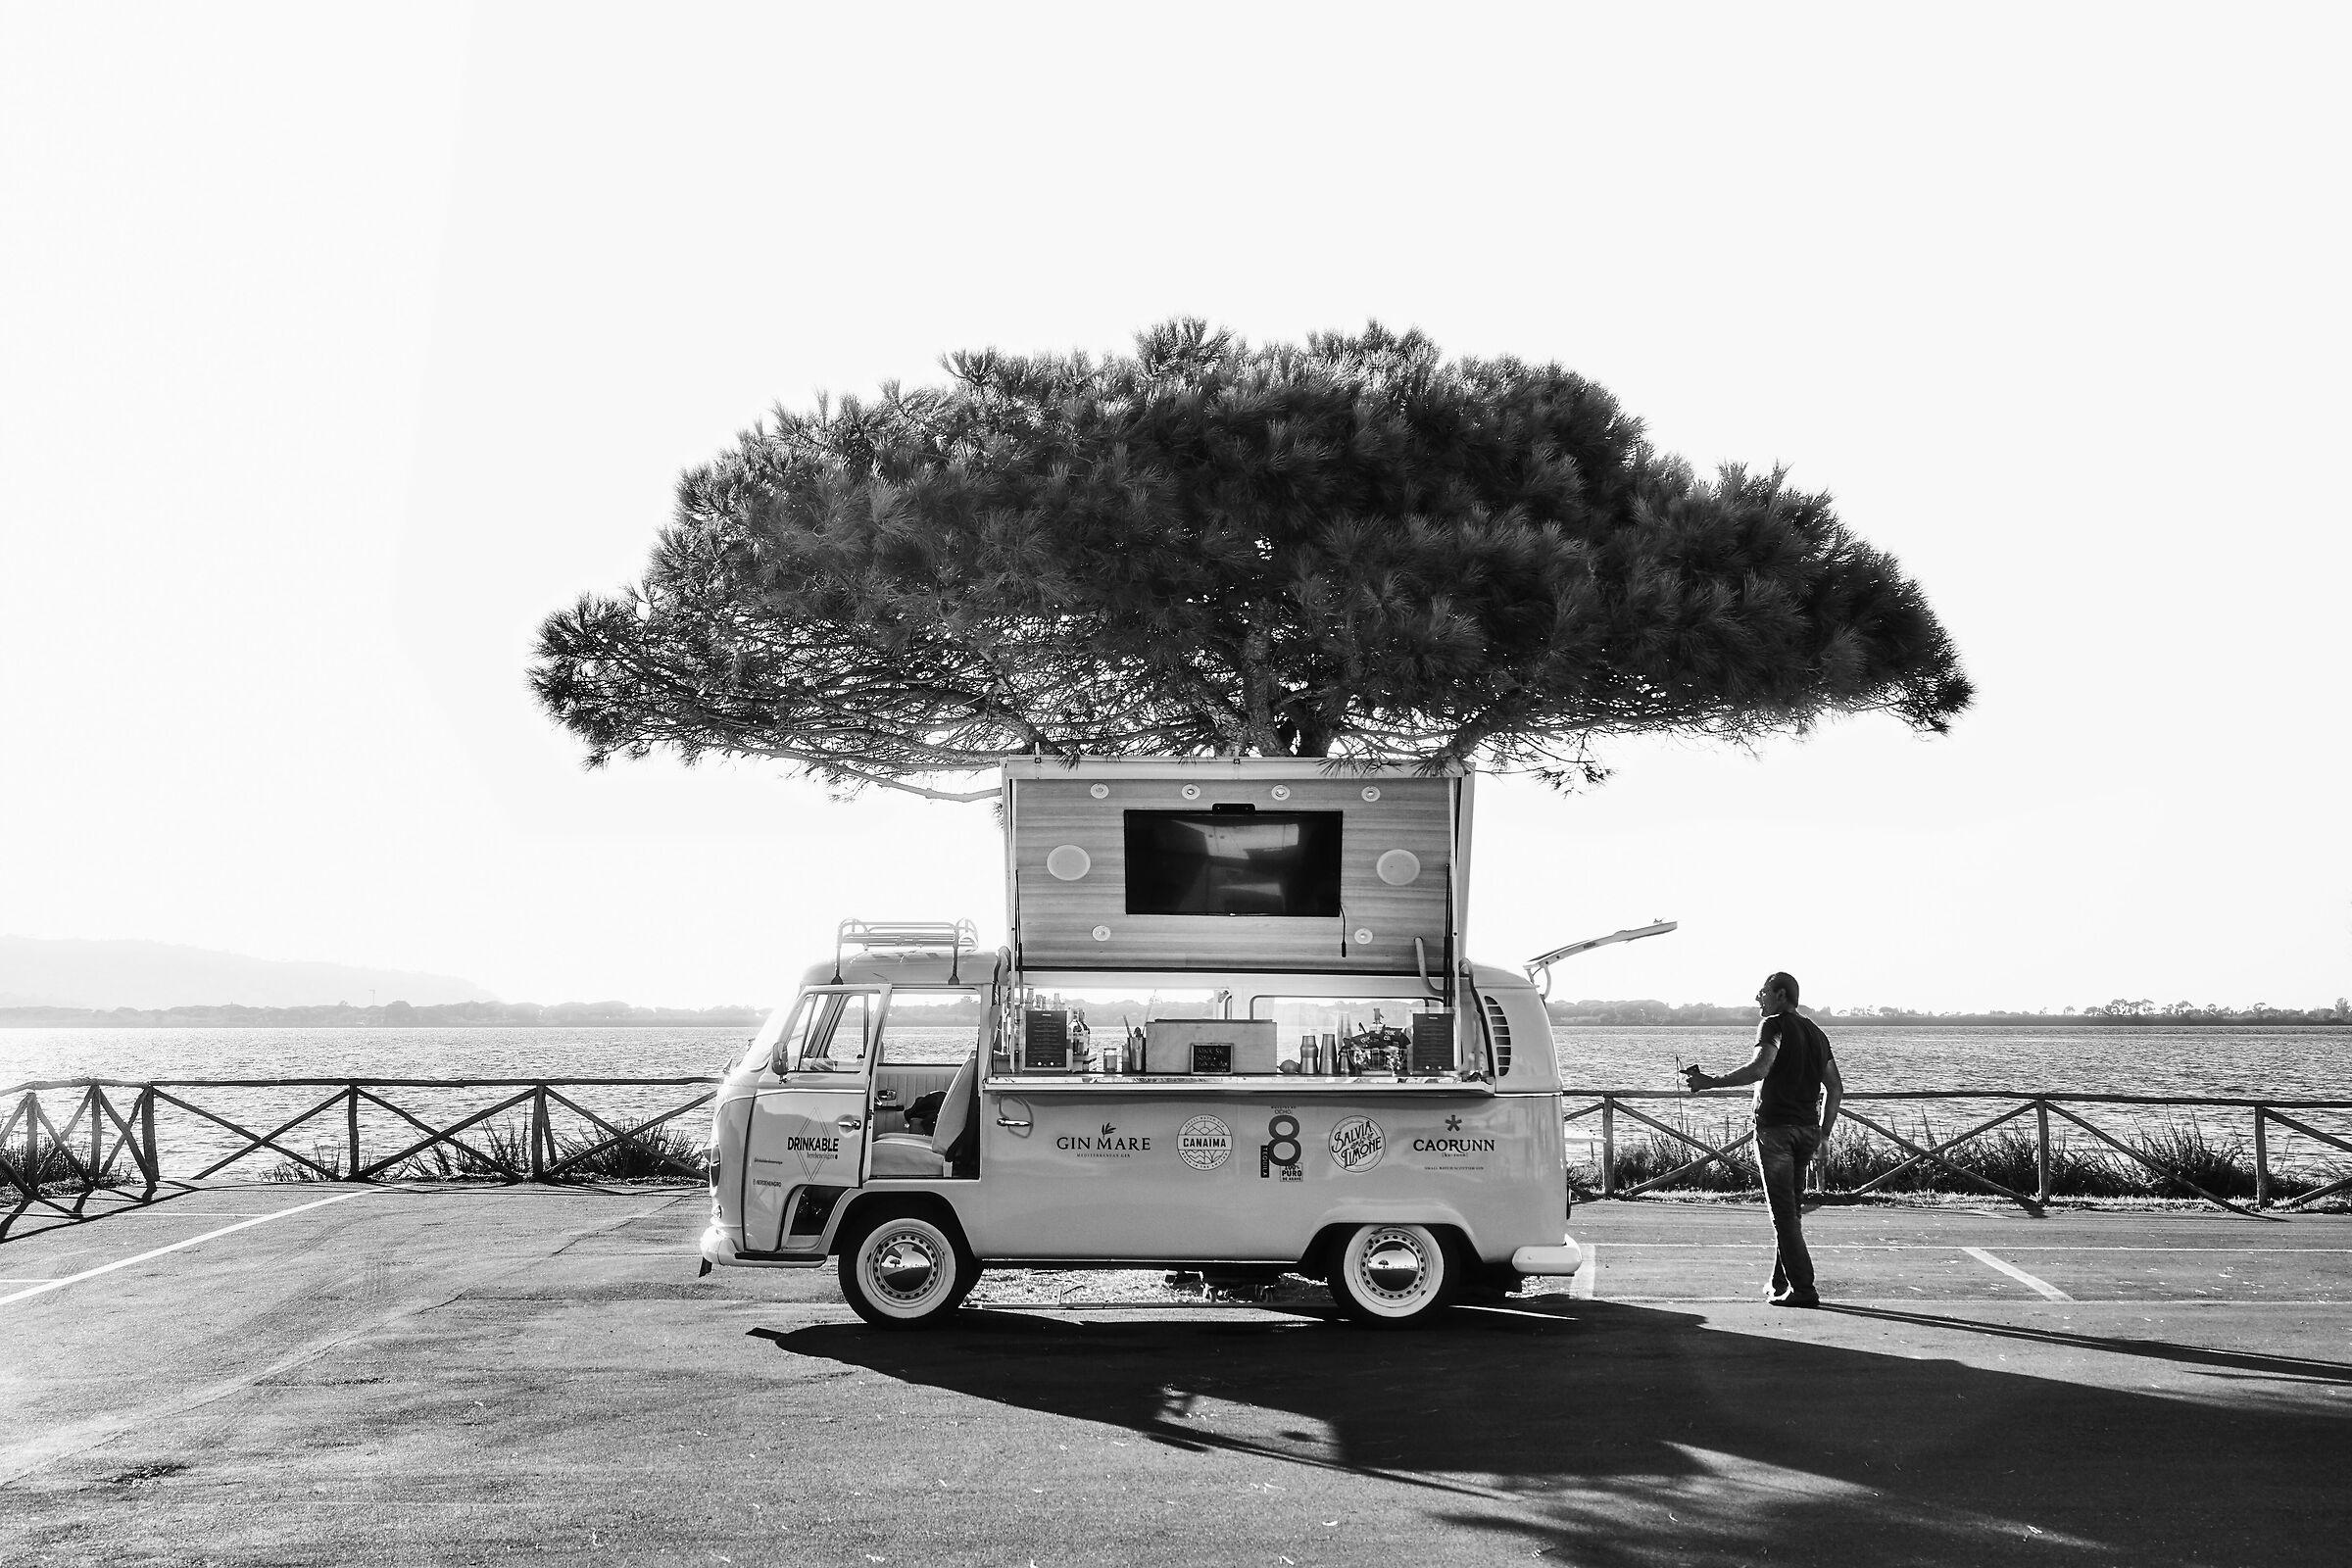 The drink dream car...